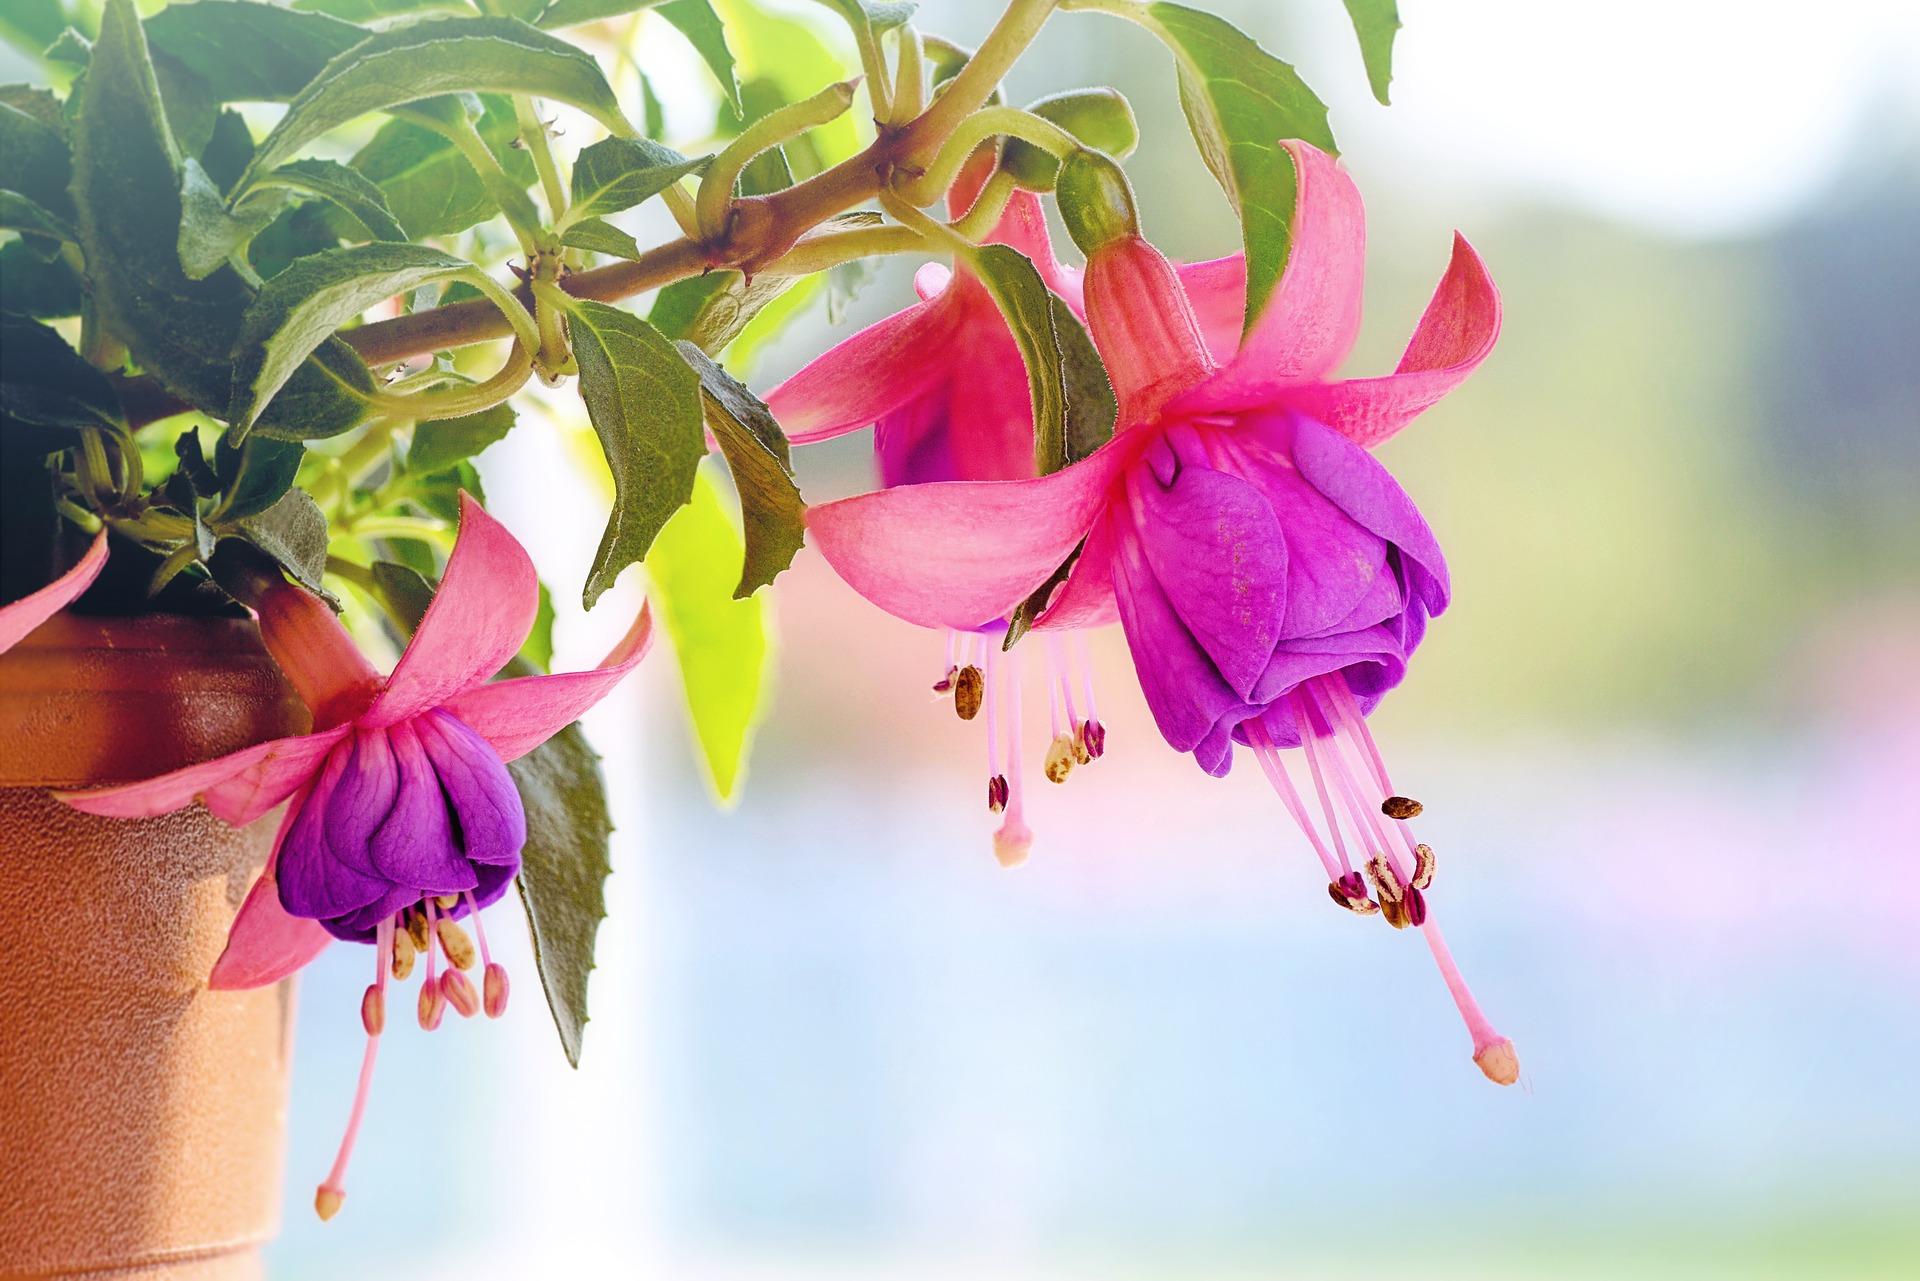 Ảnh nền hoa Vân Anh - Fuchsia